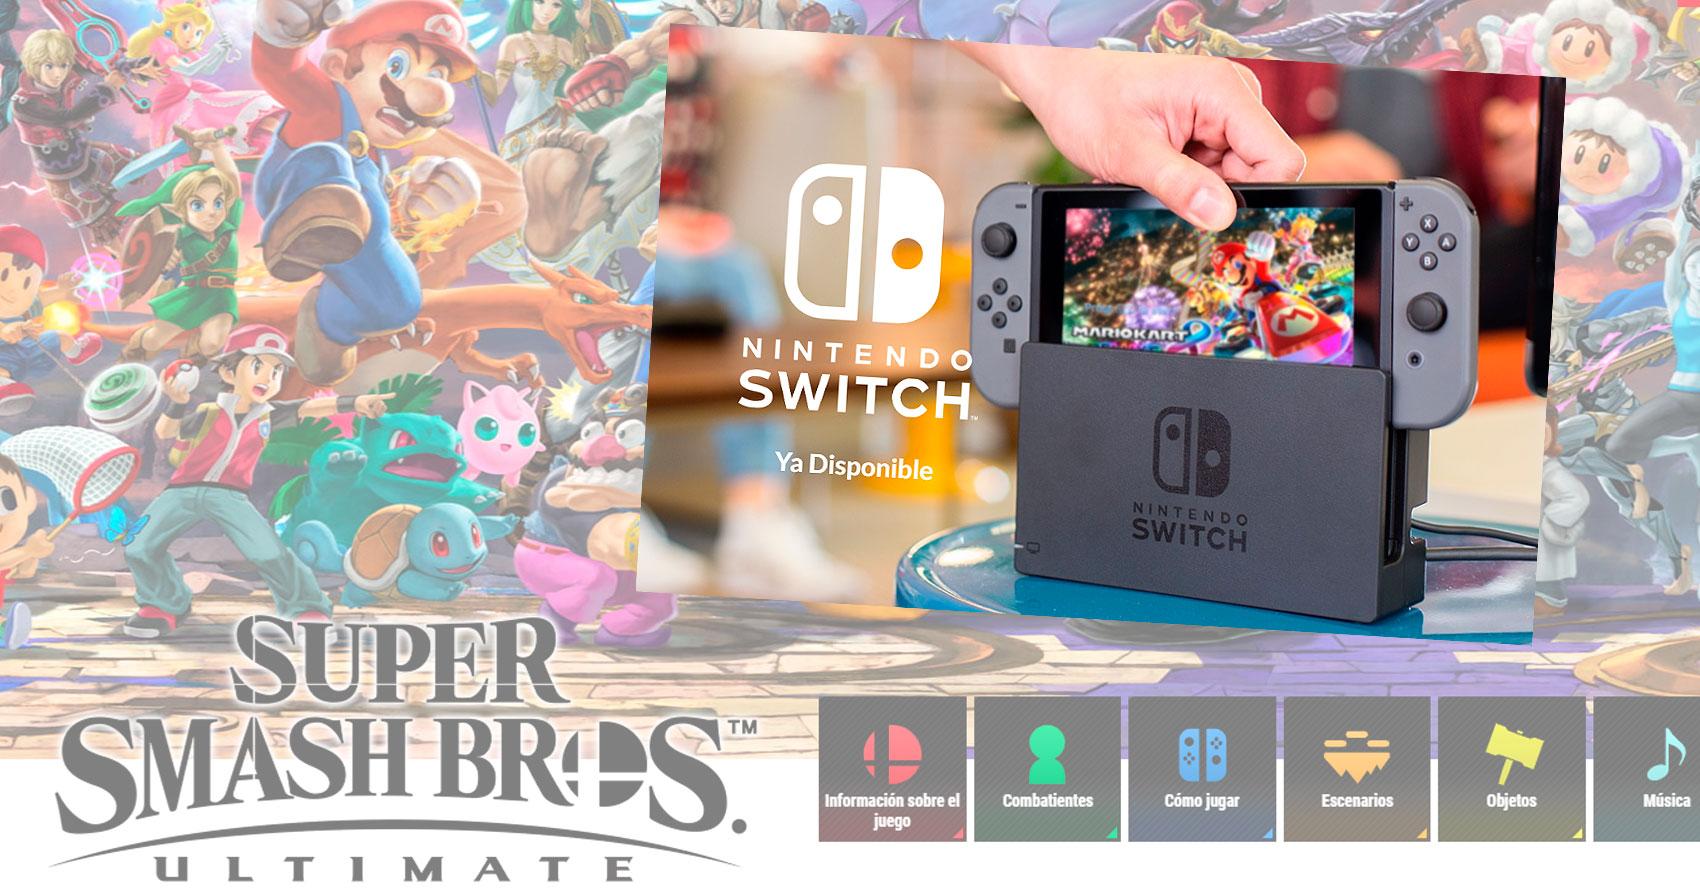 Nintendo Switch Super Smash Bros Ultimate Ecosbox